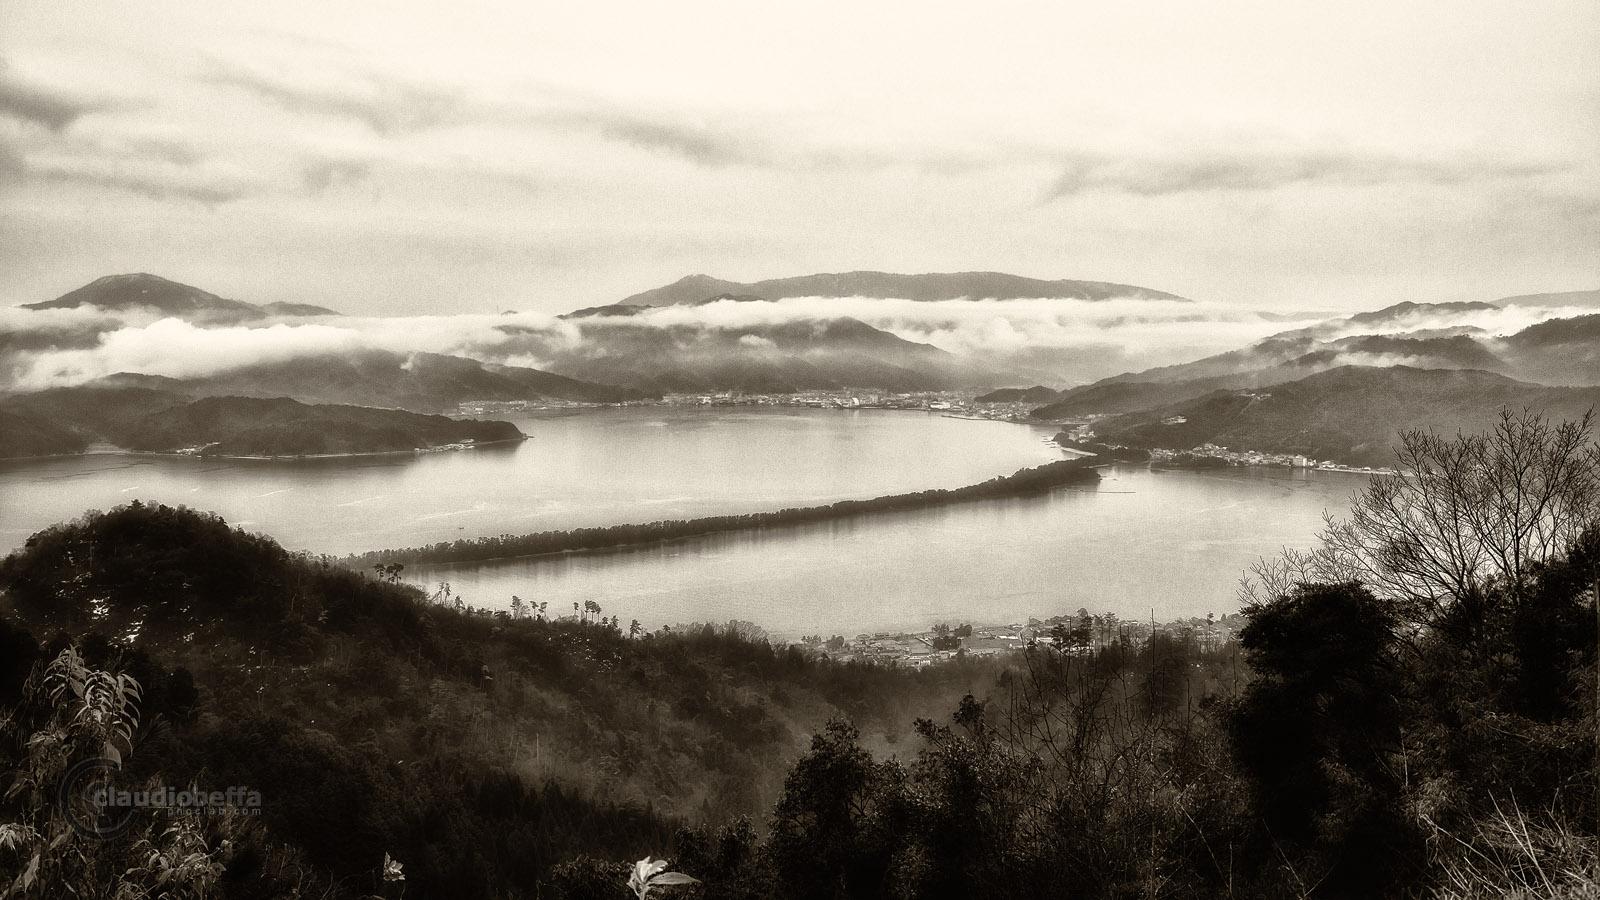 Amanohashidate Bridge Heaven Landscape Sumi-e painting B&W Japan Pentax